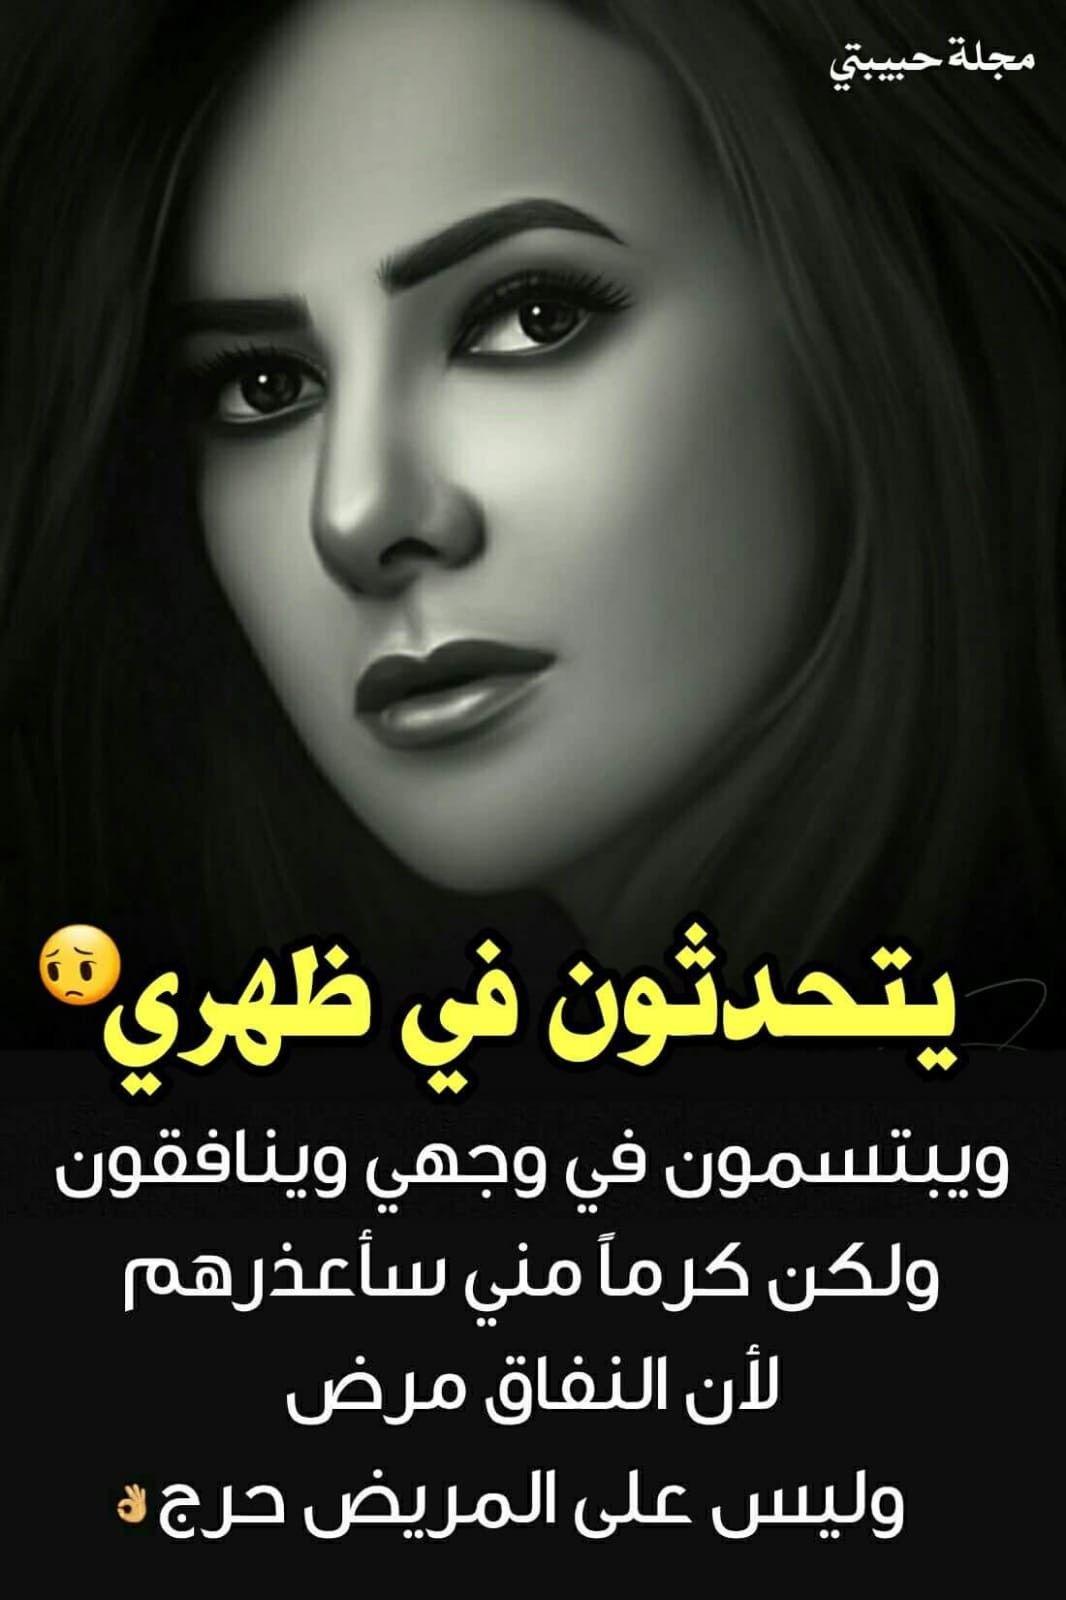 فعلا اقسم بالله مريضه بالرجاله Photo Quotes Arabic Quotes Quotations